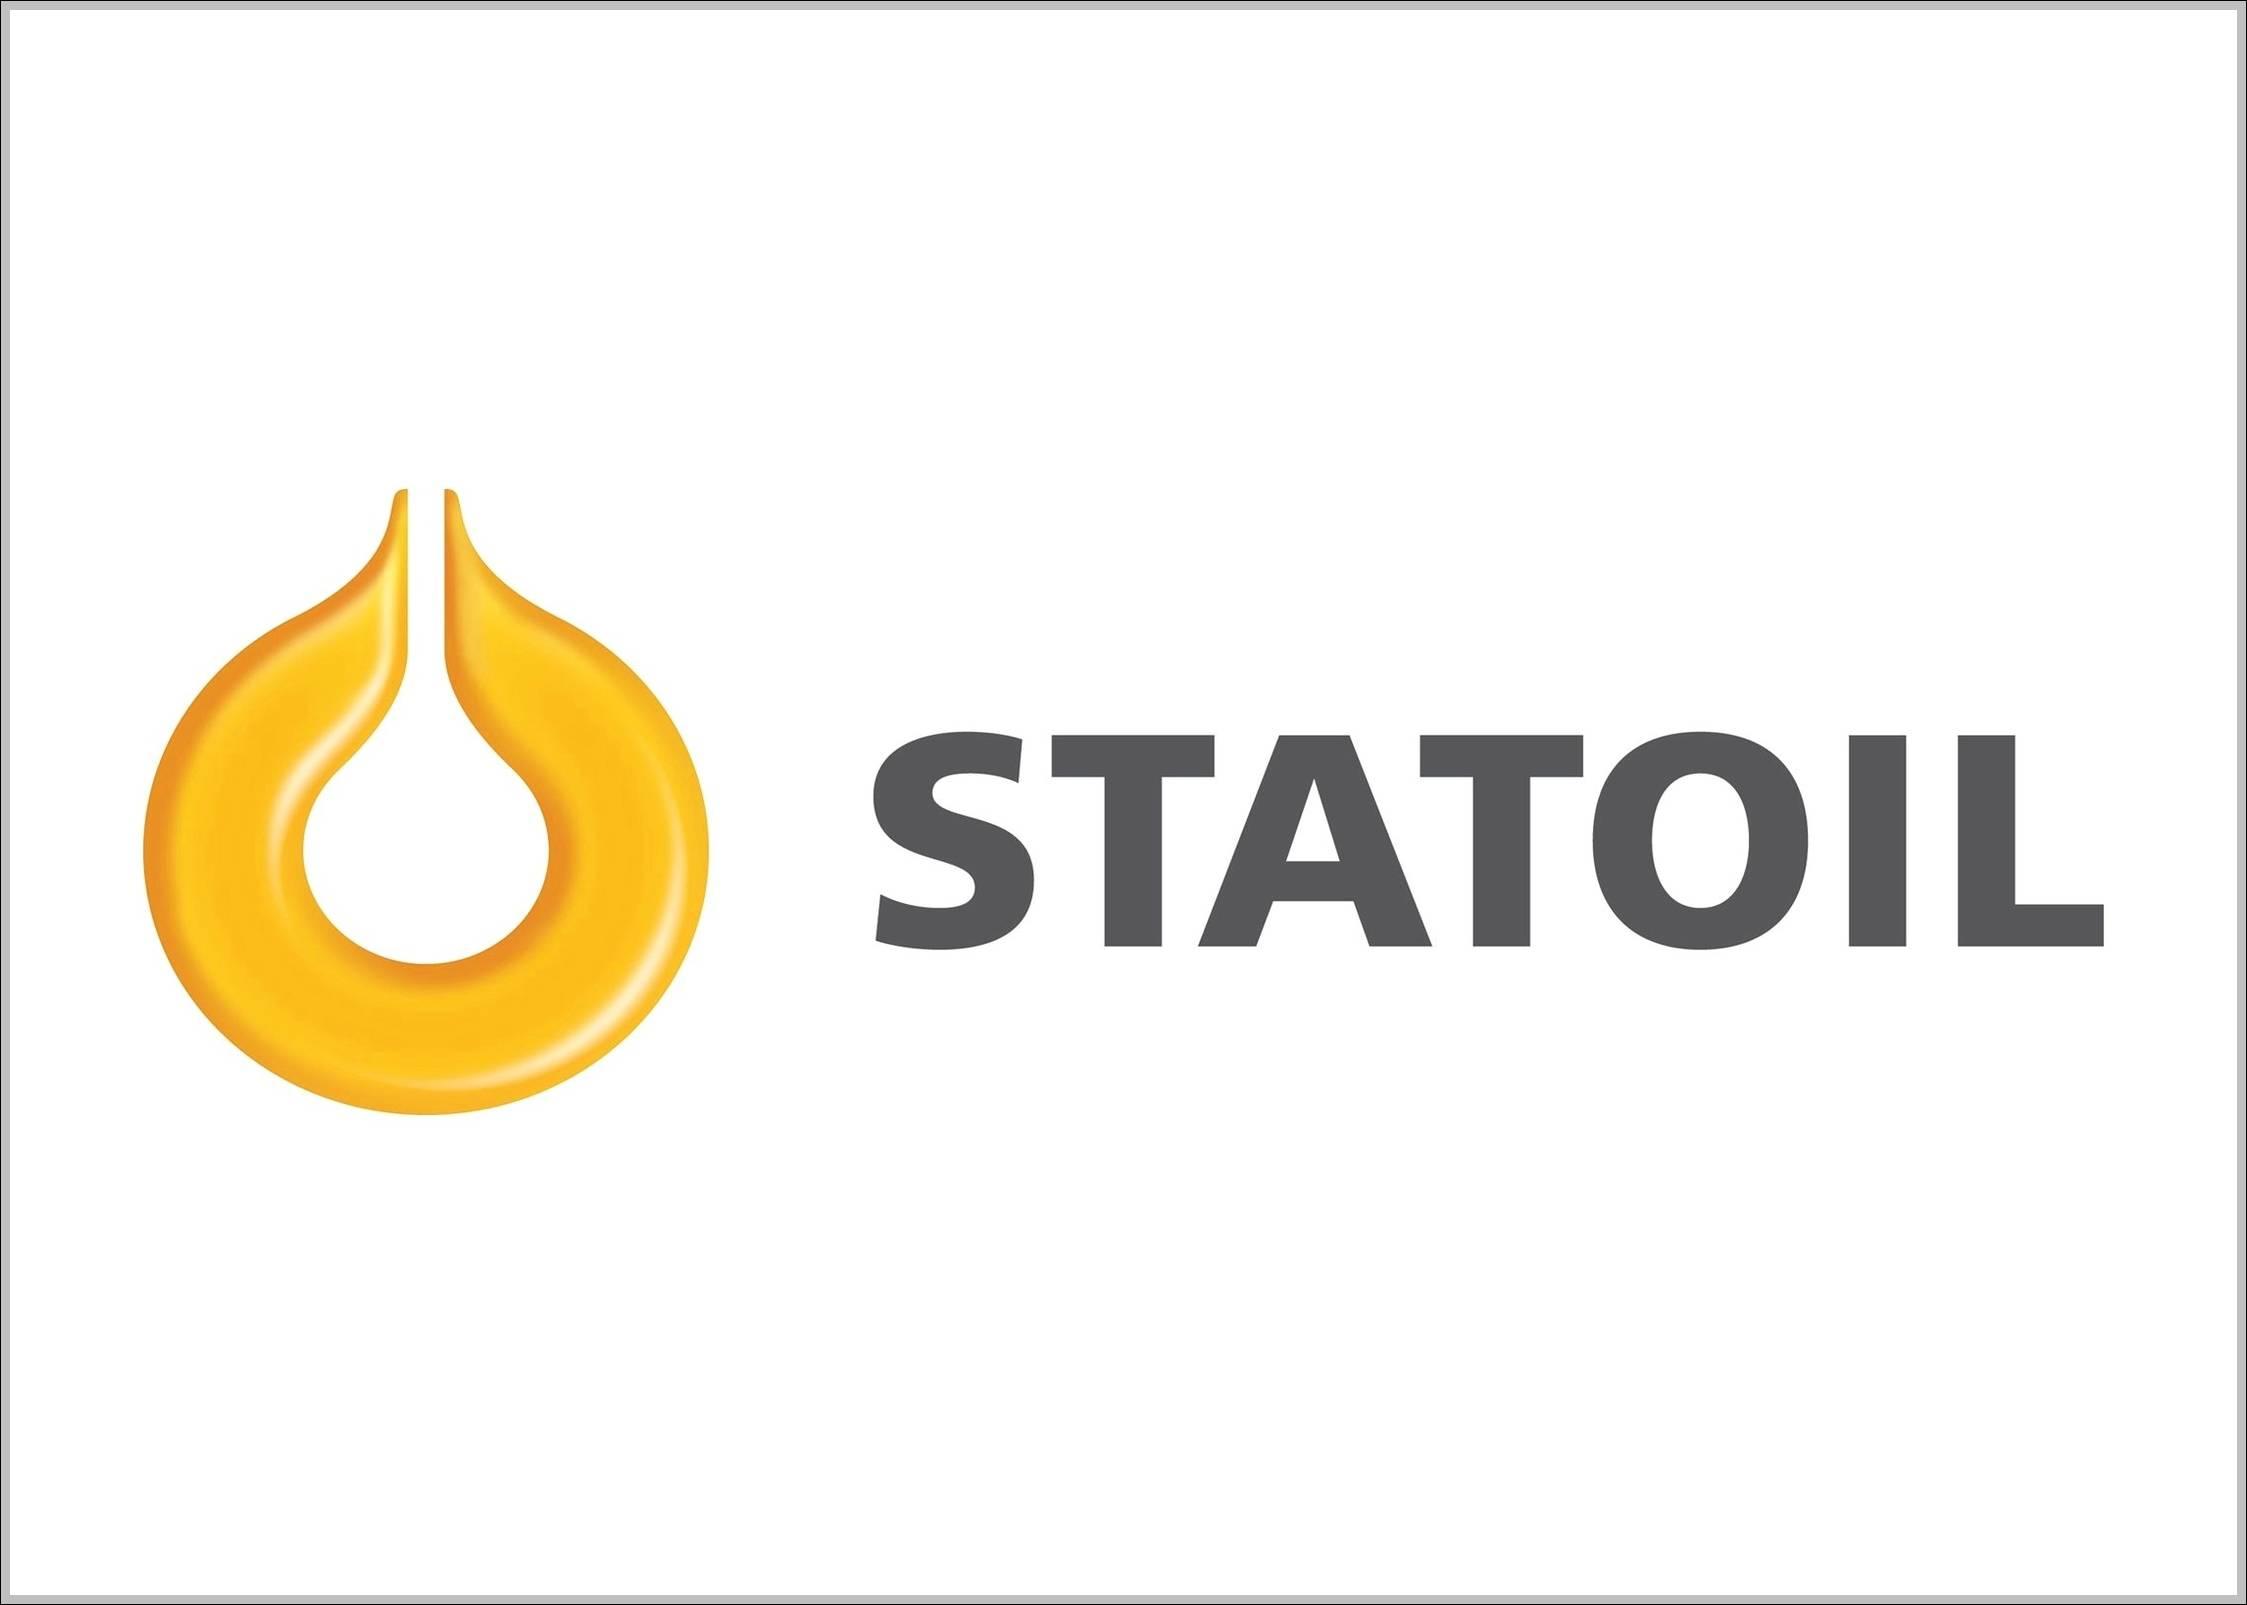 Statoil logo old